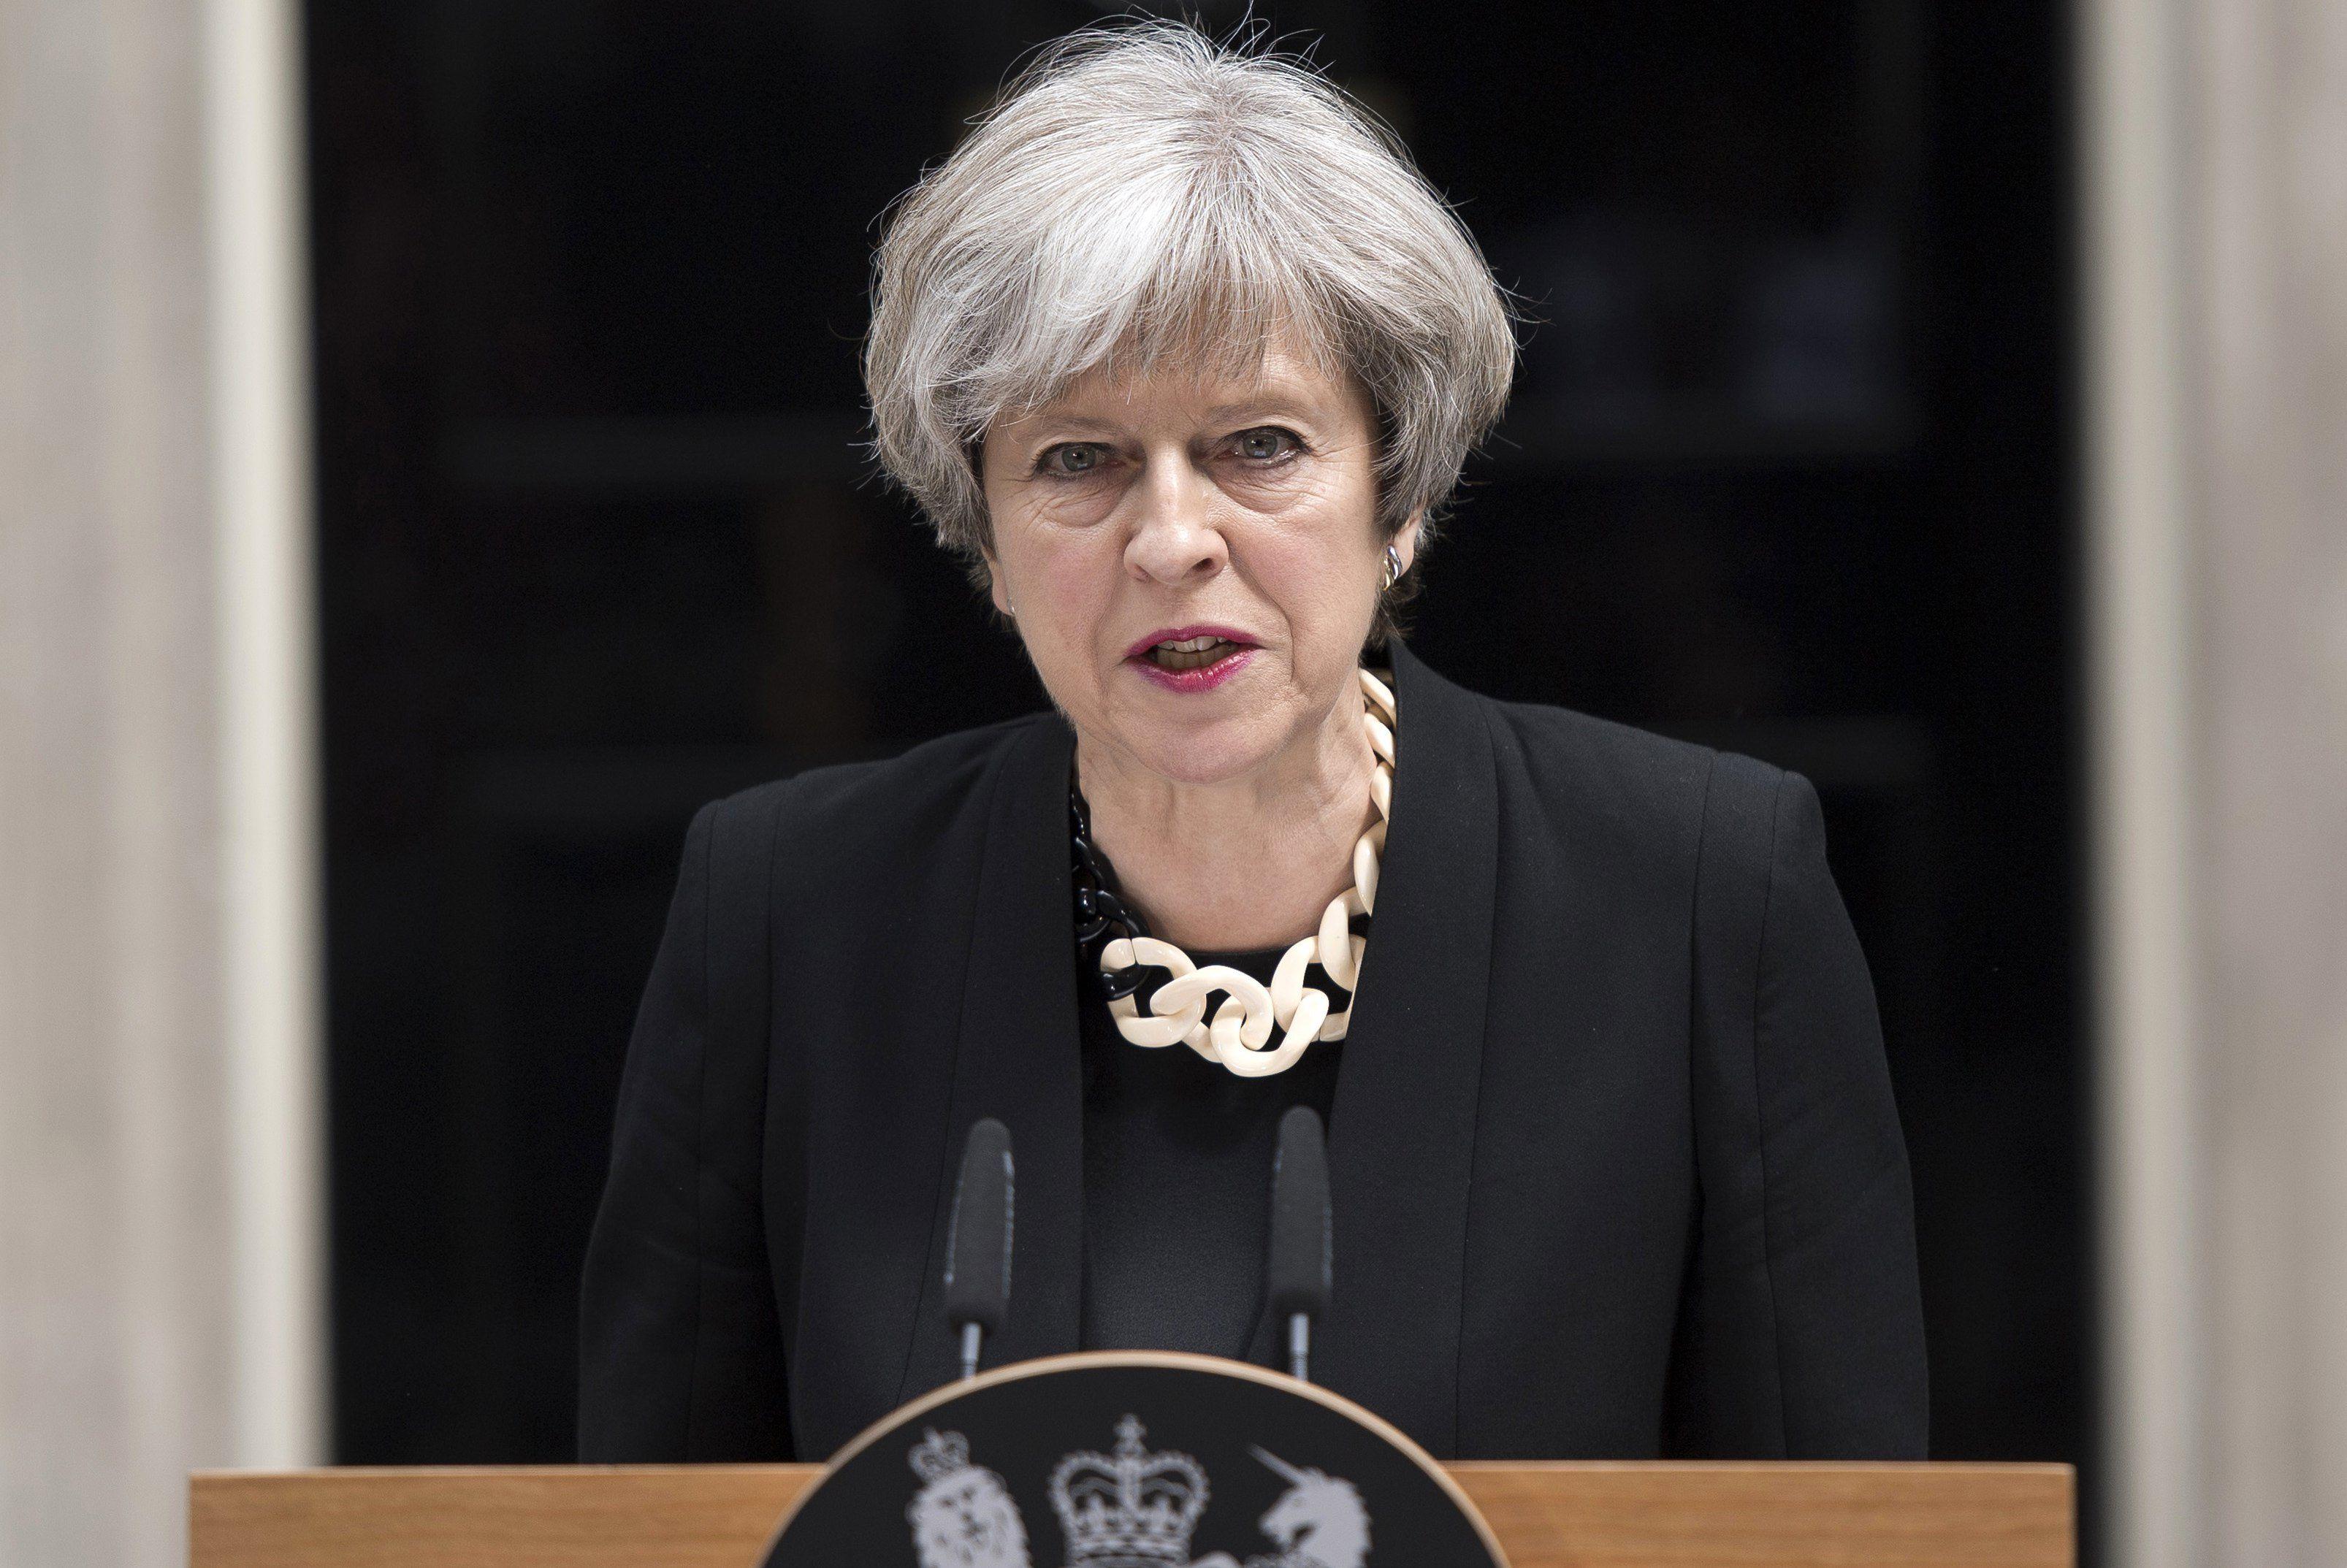 Theresa May habló de reforzar leyes antiterroristas